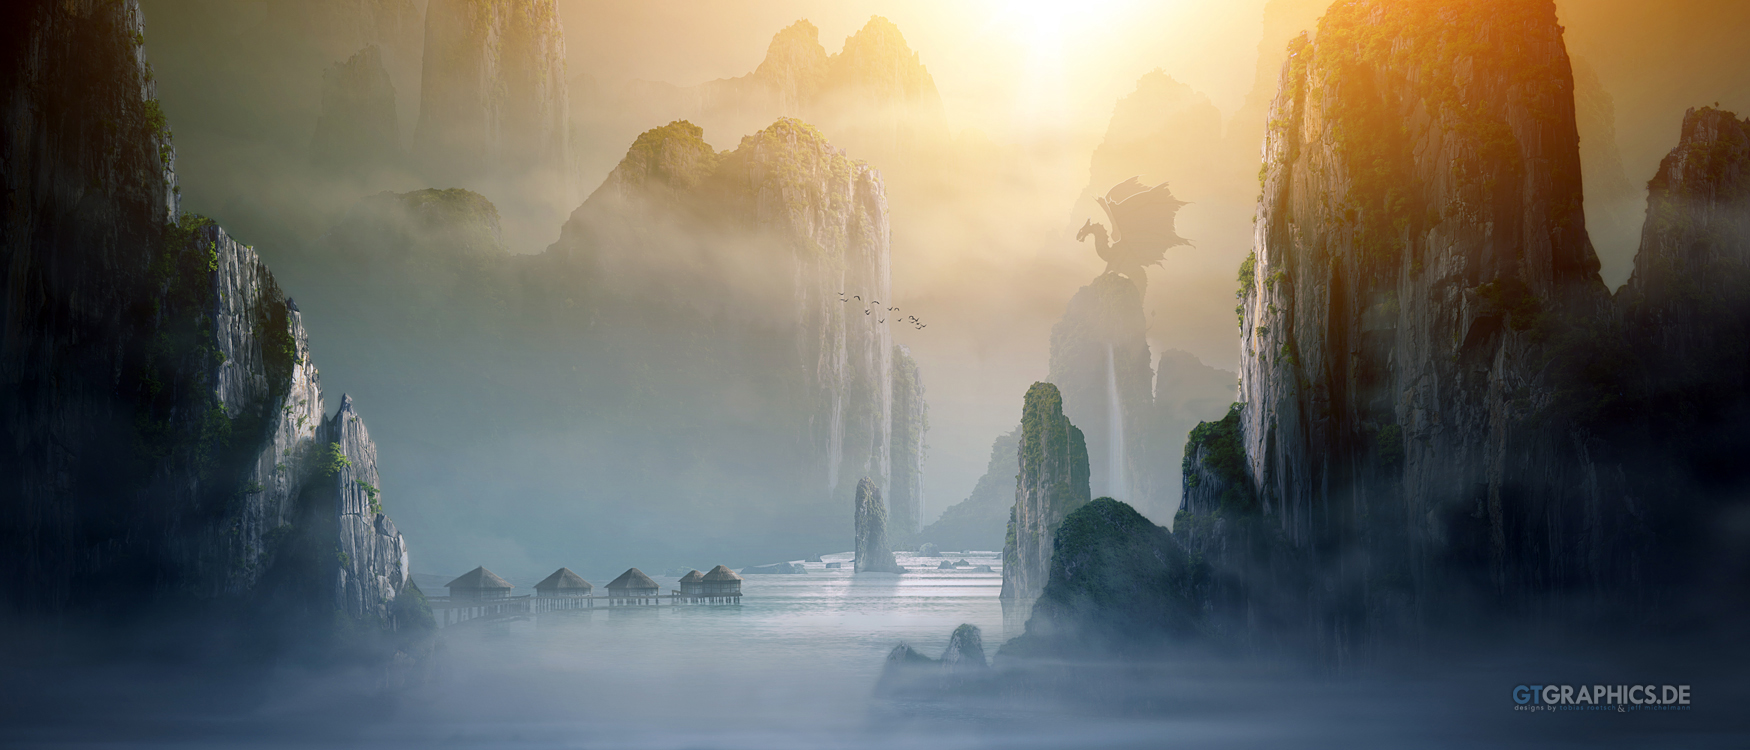 Misty Mountains by taenaron